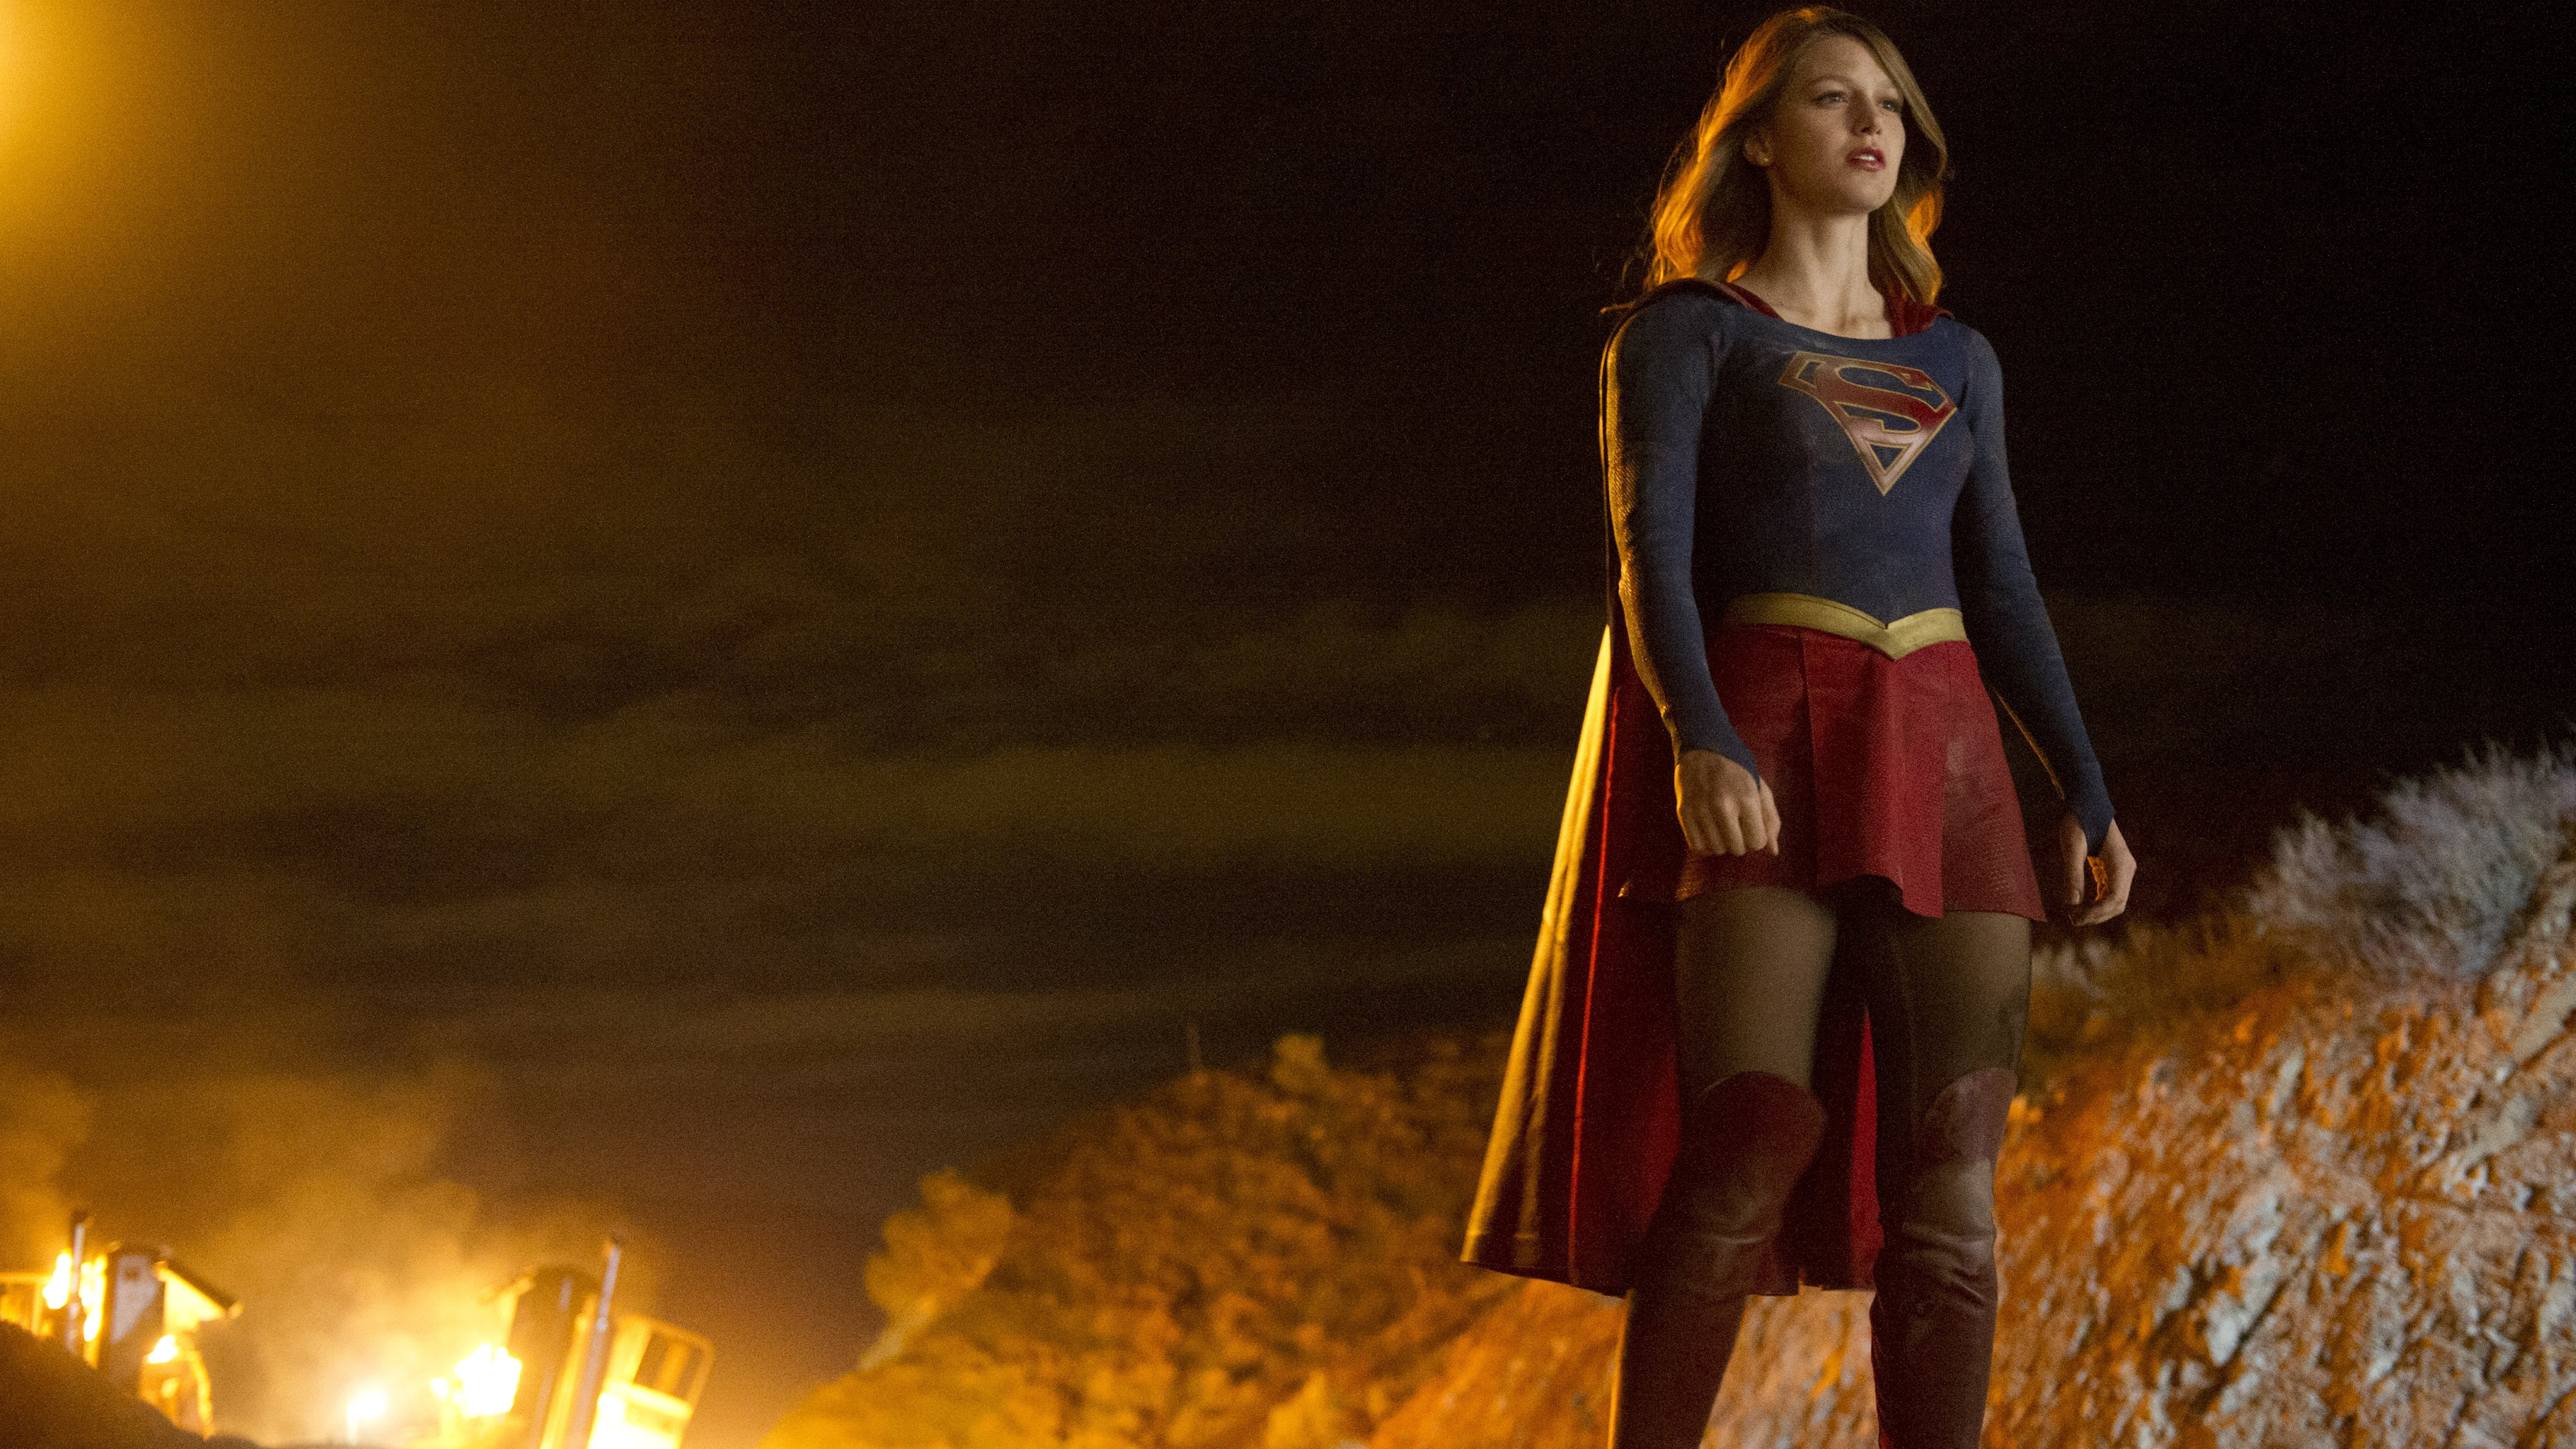 melissa benoist supergirl 1577911458 - Melissa Benoist Supergirl - Melissa Benoist Supergirl 4k wallpaper